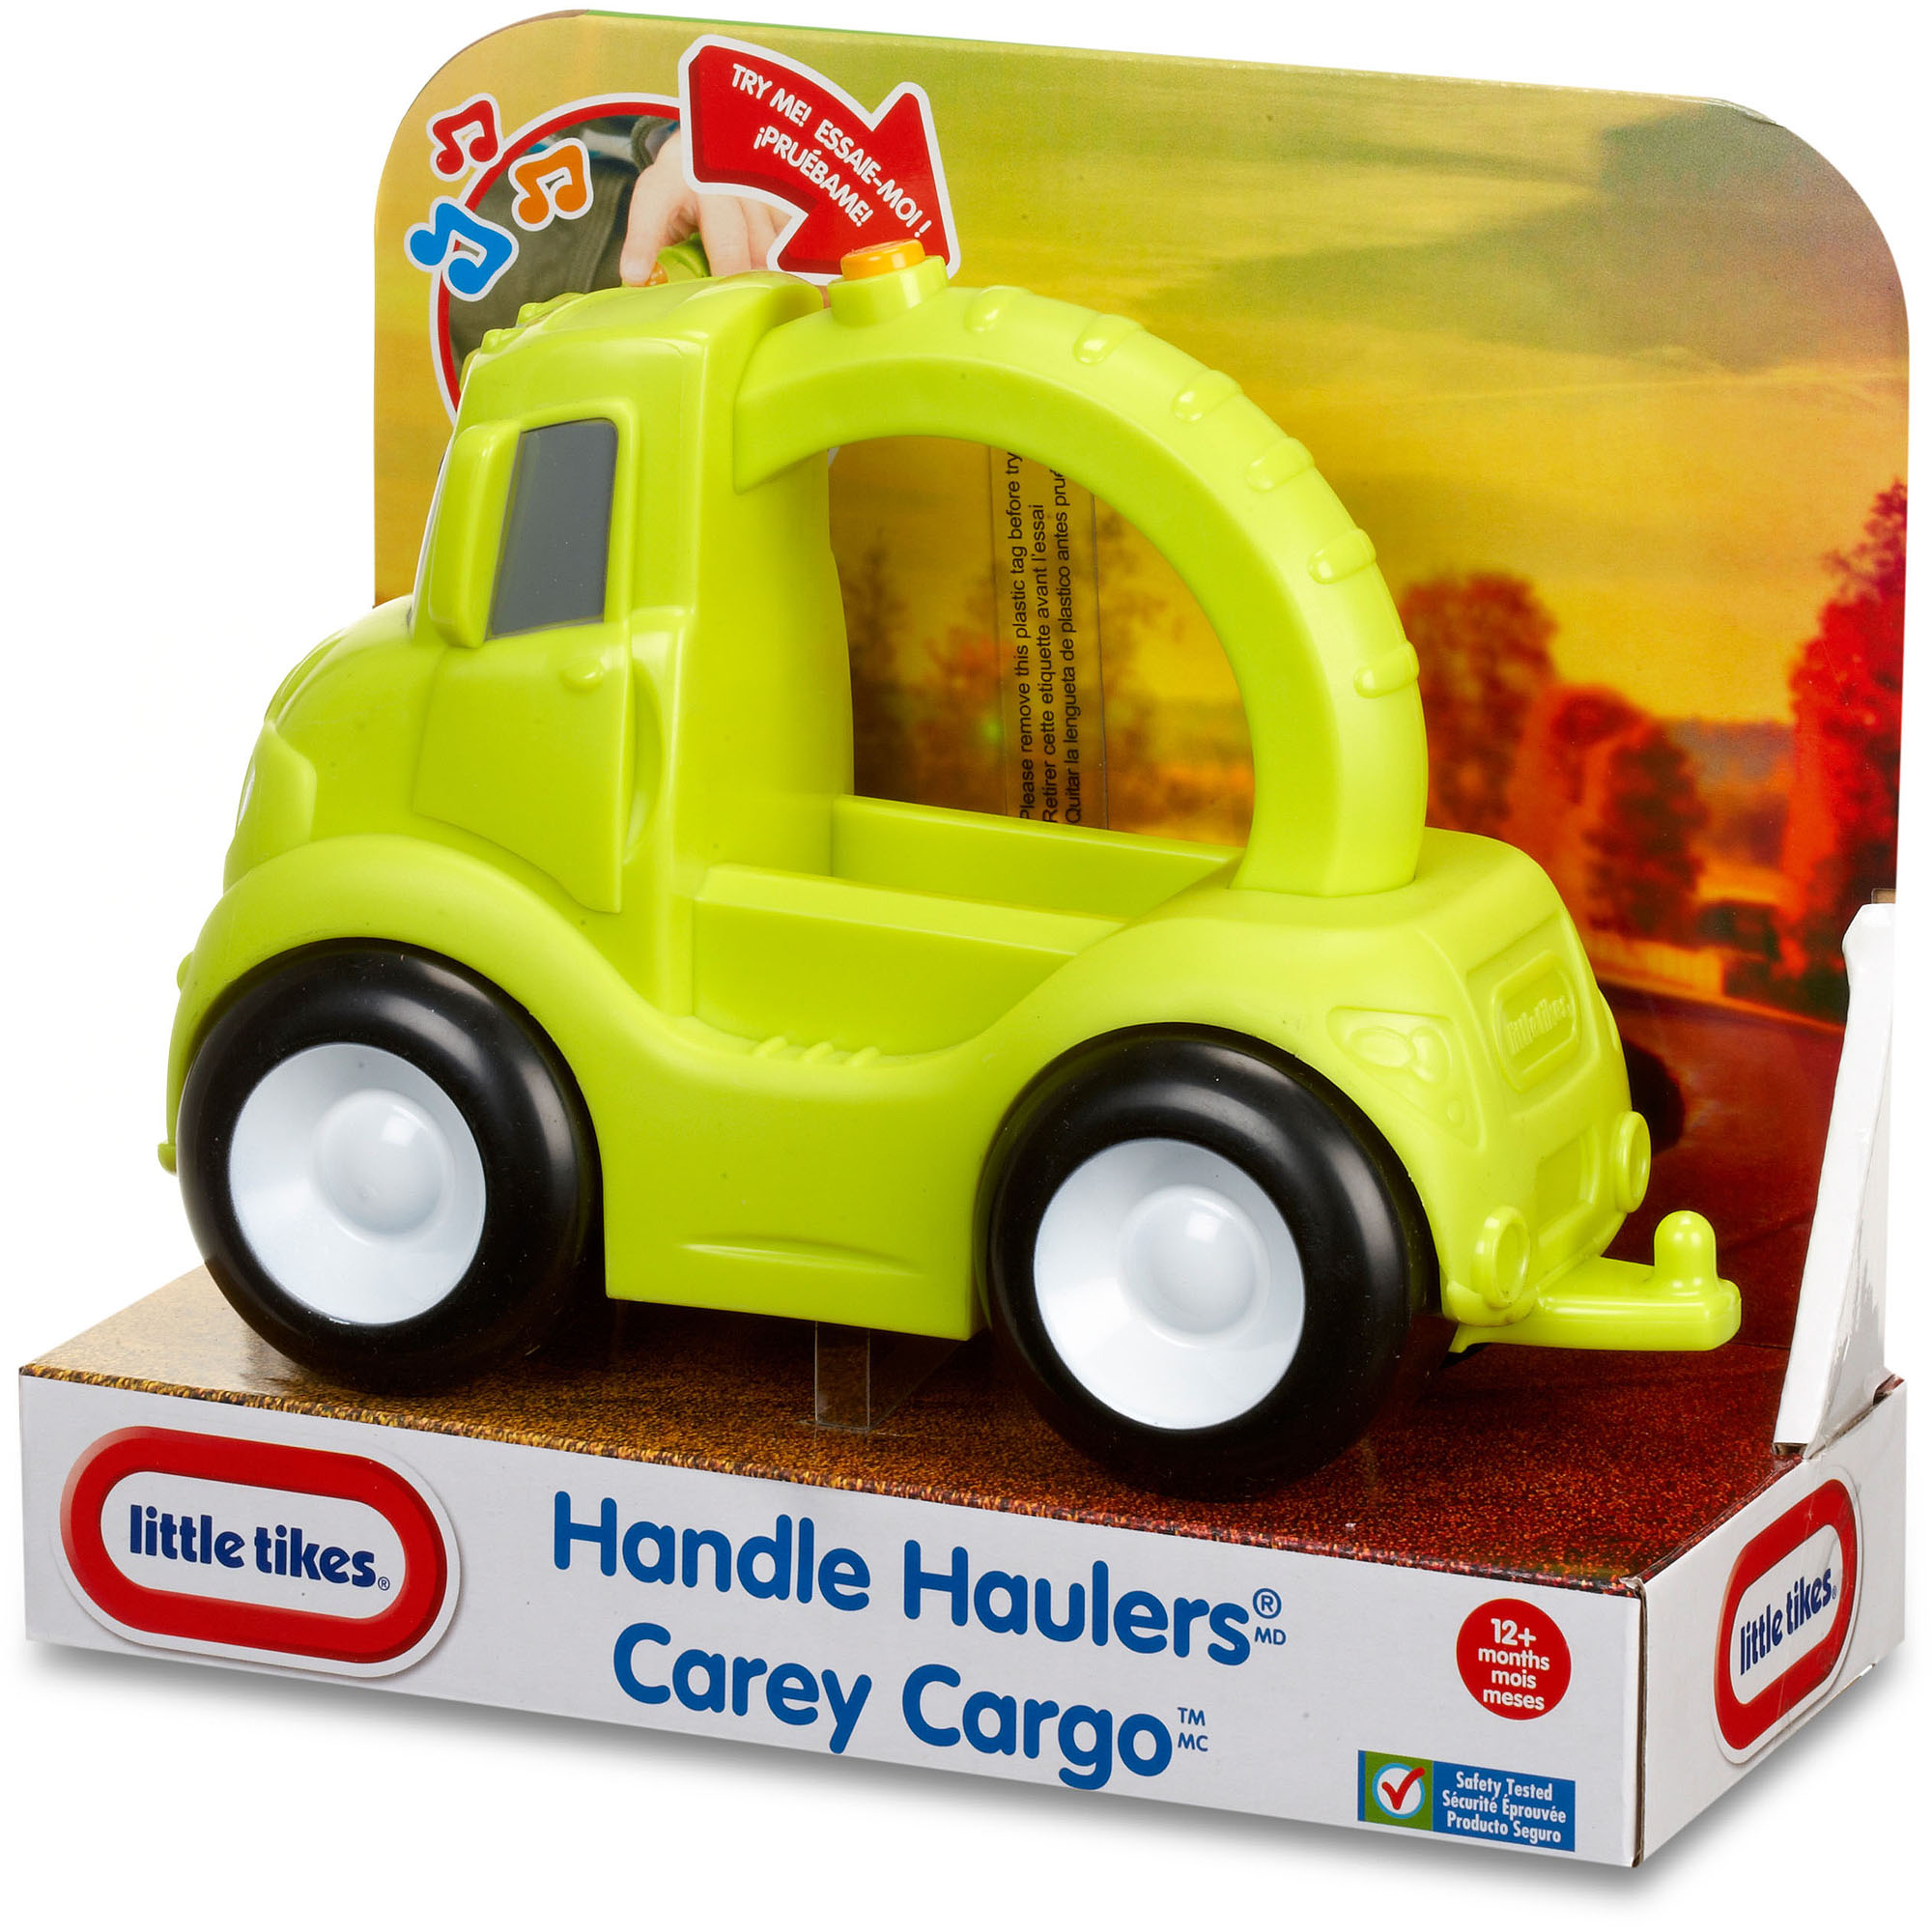 Little Tikes Handle Haulers, Carey Cargo